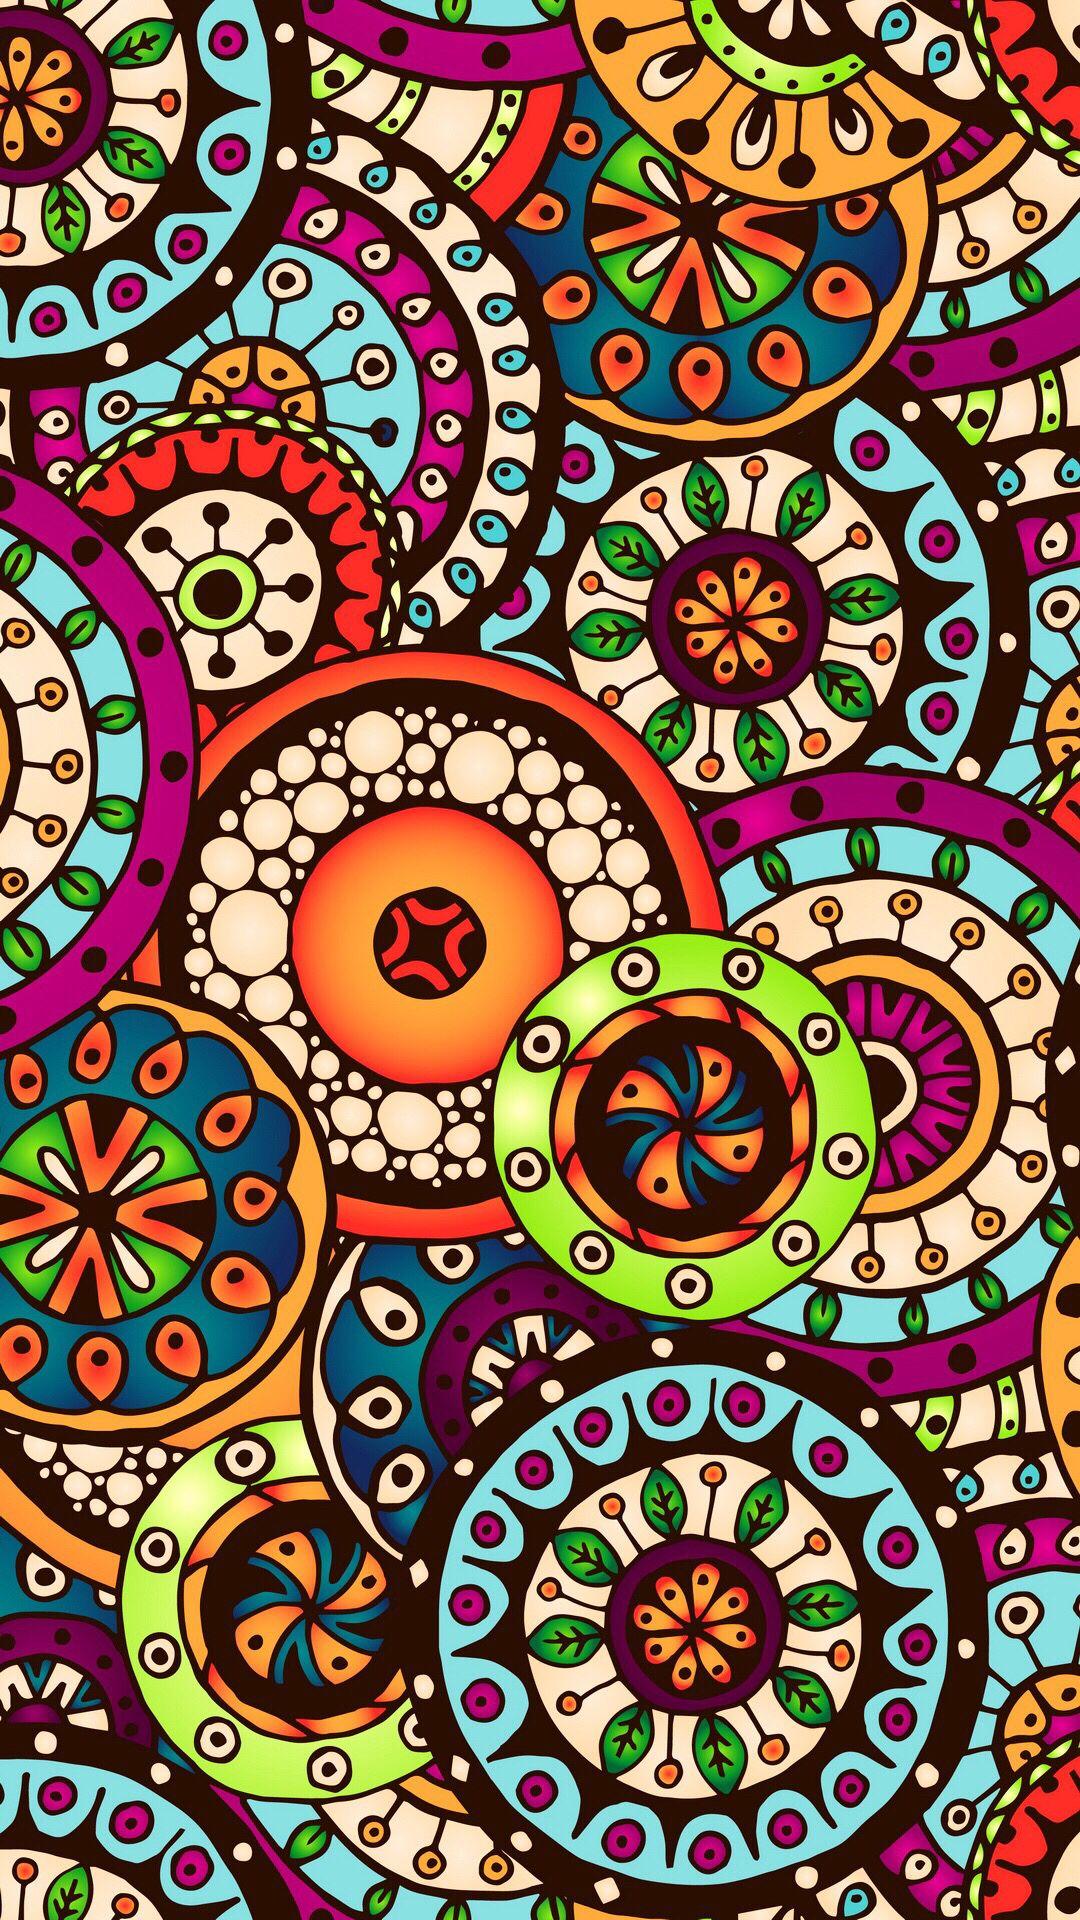 Otkrytka Iz Prilozheniya Kefir Https Kefirapp Com C 2958454 Pattern Art Graphic Wallpaper Mandala Wallpaper